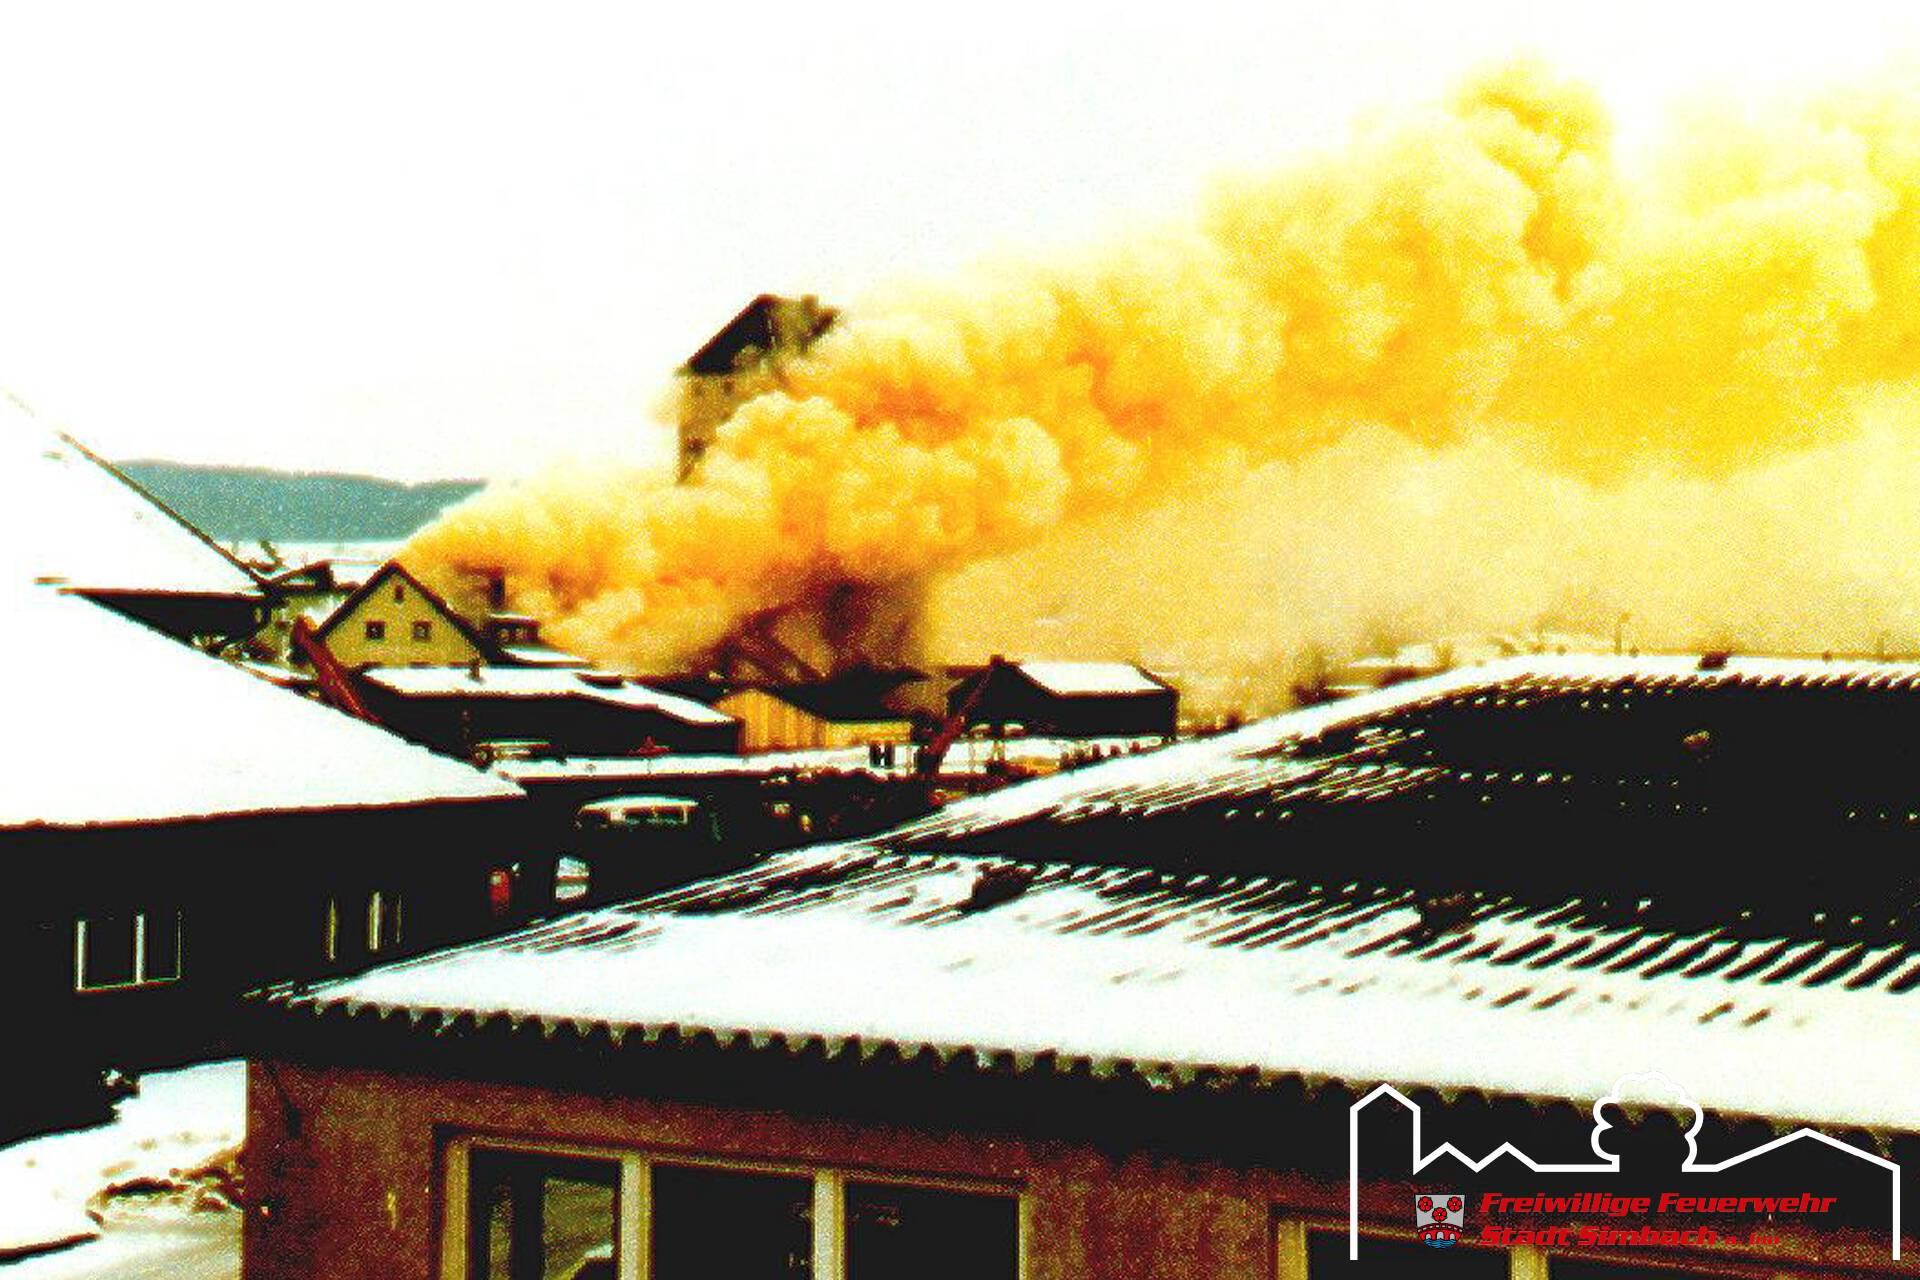 Brand Lagerhaus Oberlechner 12.12.1980 (5)